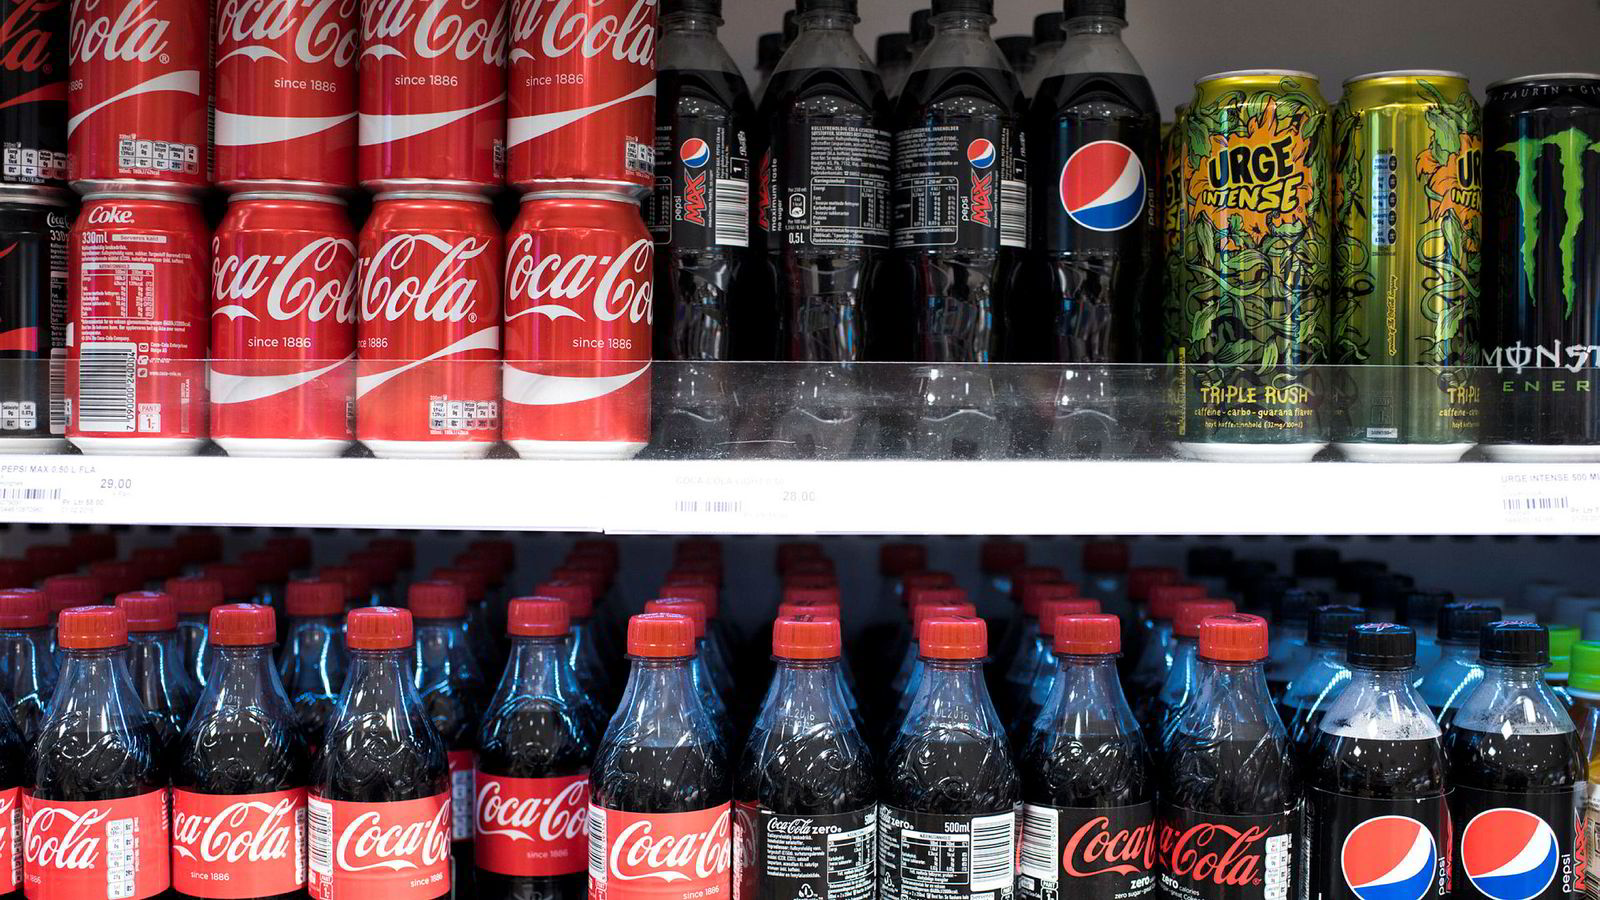 Coca-Cola Company vant navnesak over en liten brusprodusent i Oslo.